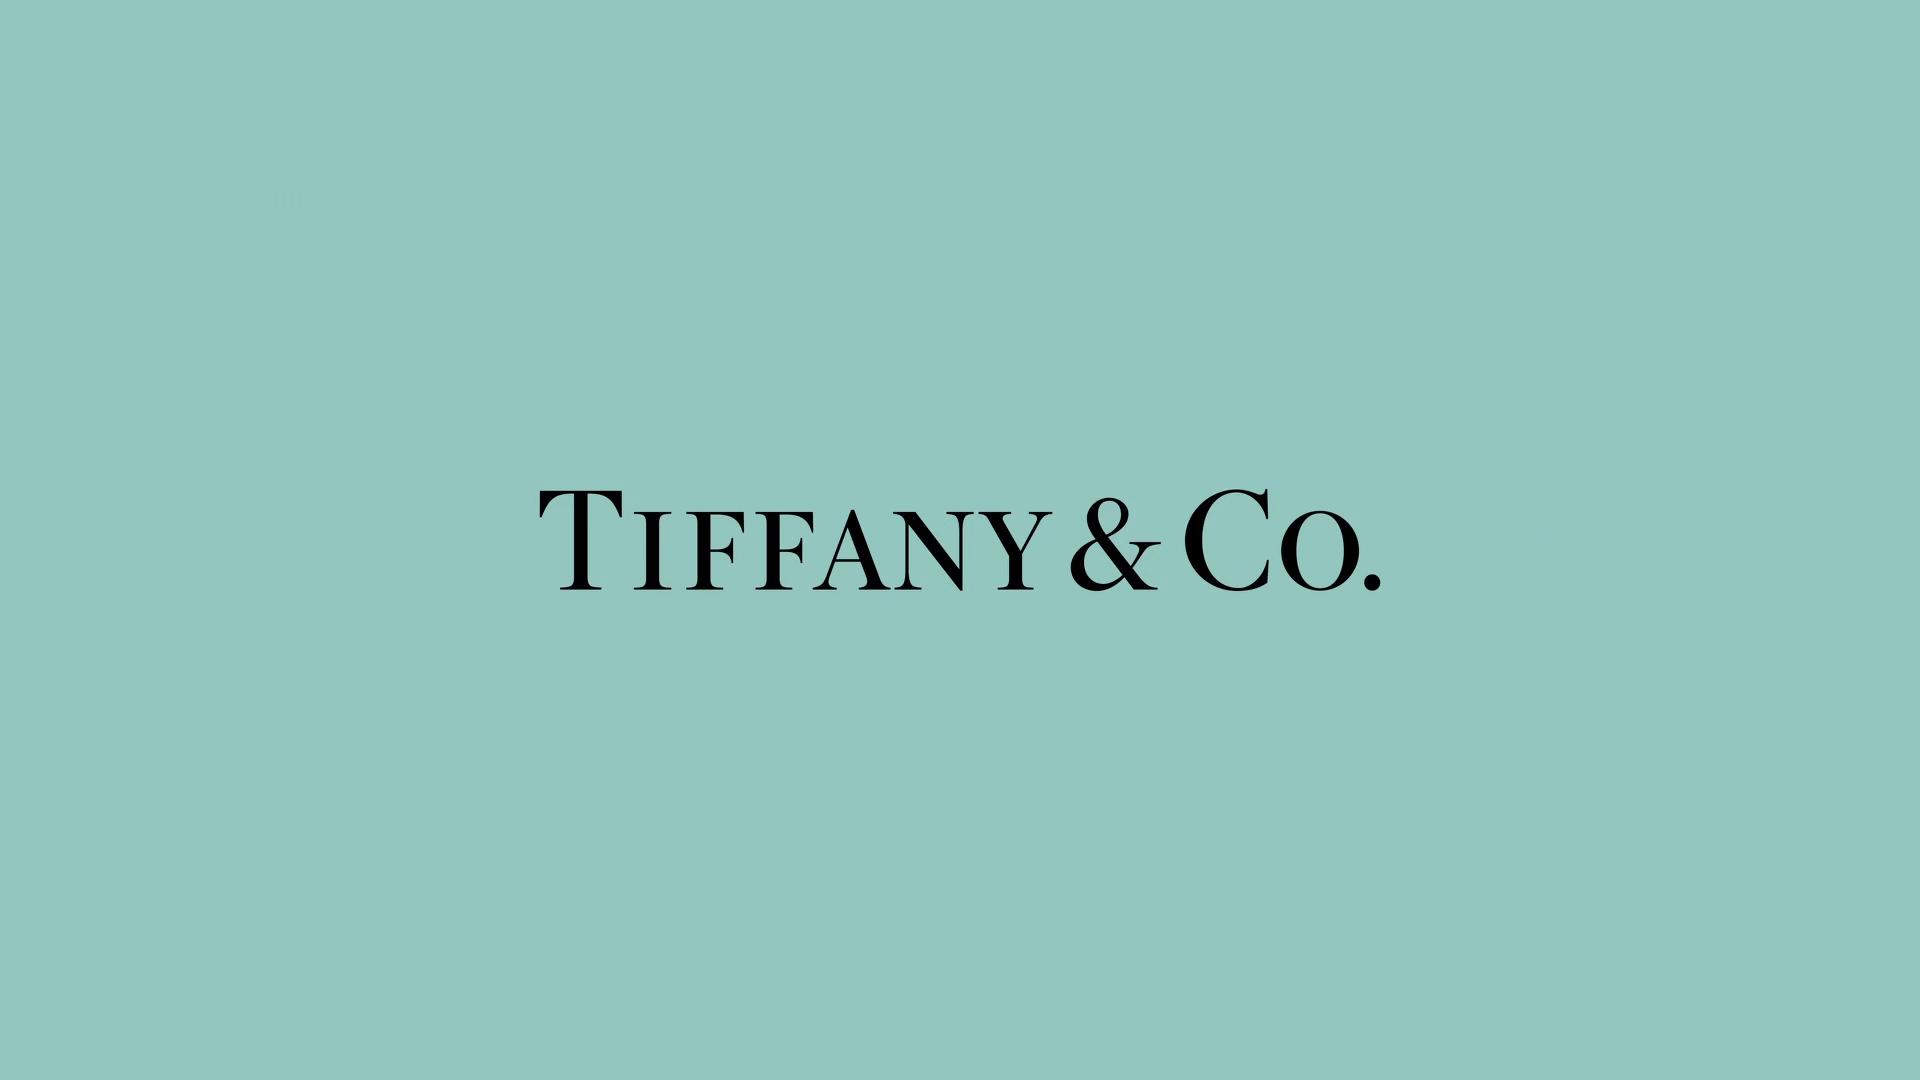 Tiffany & Co. 2017 Fall Campaign